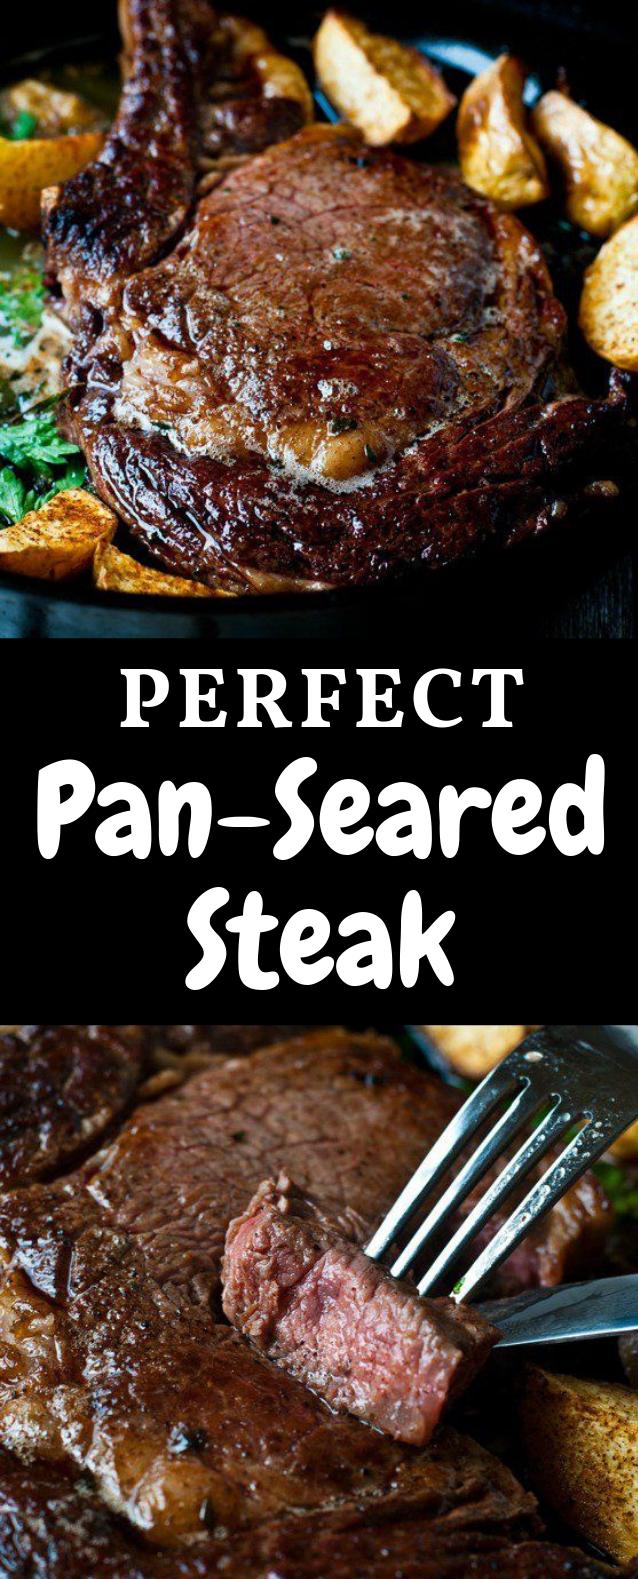 Perfect Pan-Seared Steak #Dinner #Steak